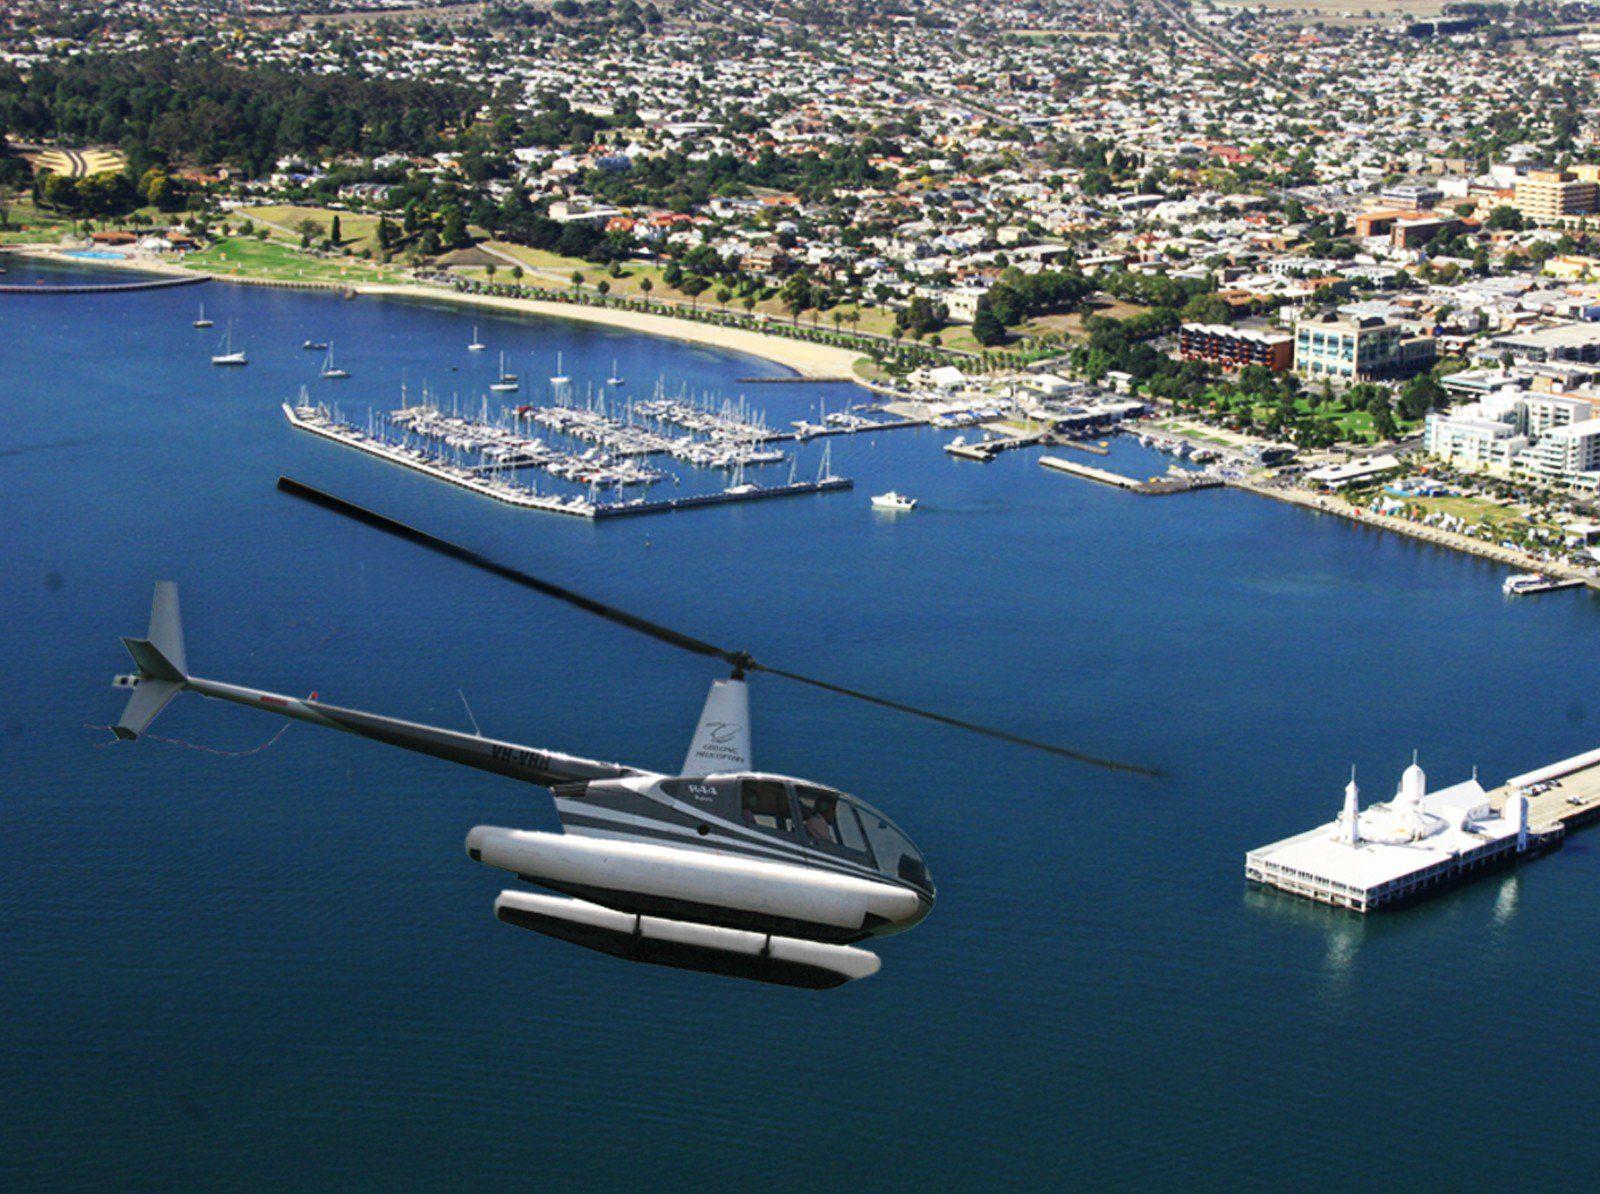 Helicopter flight over Corio Bay